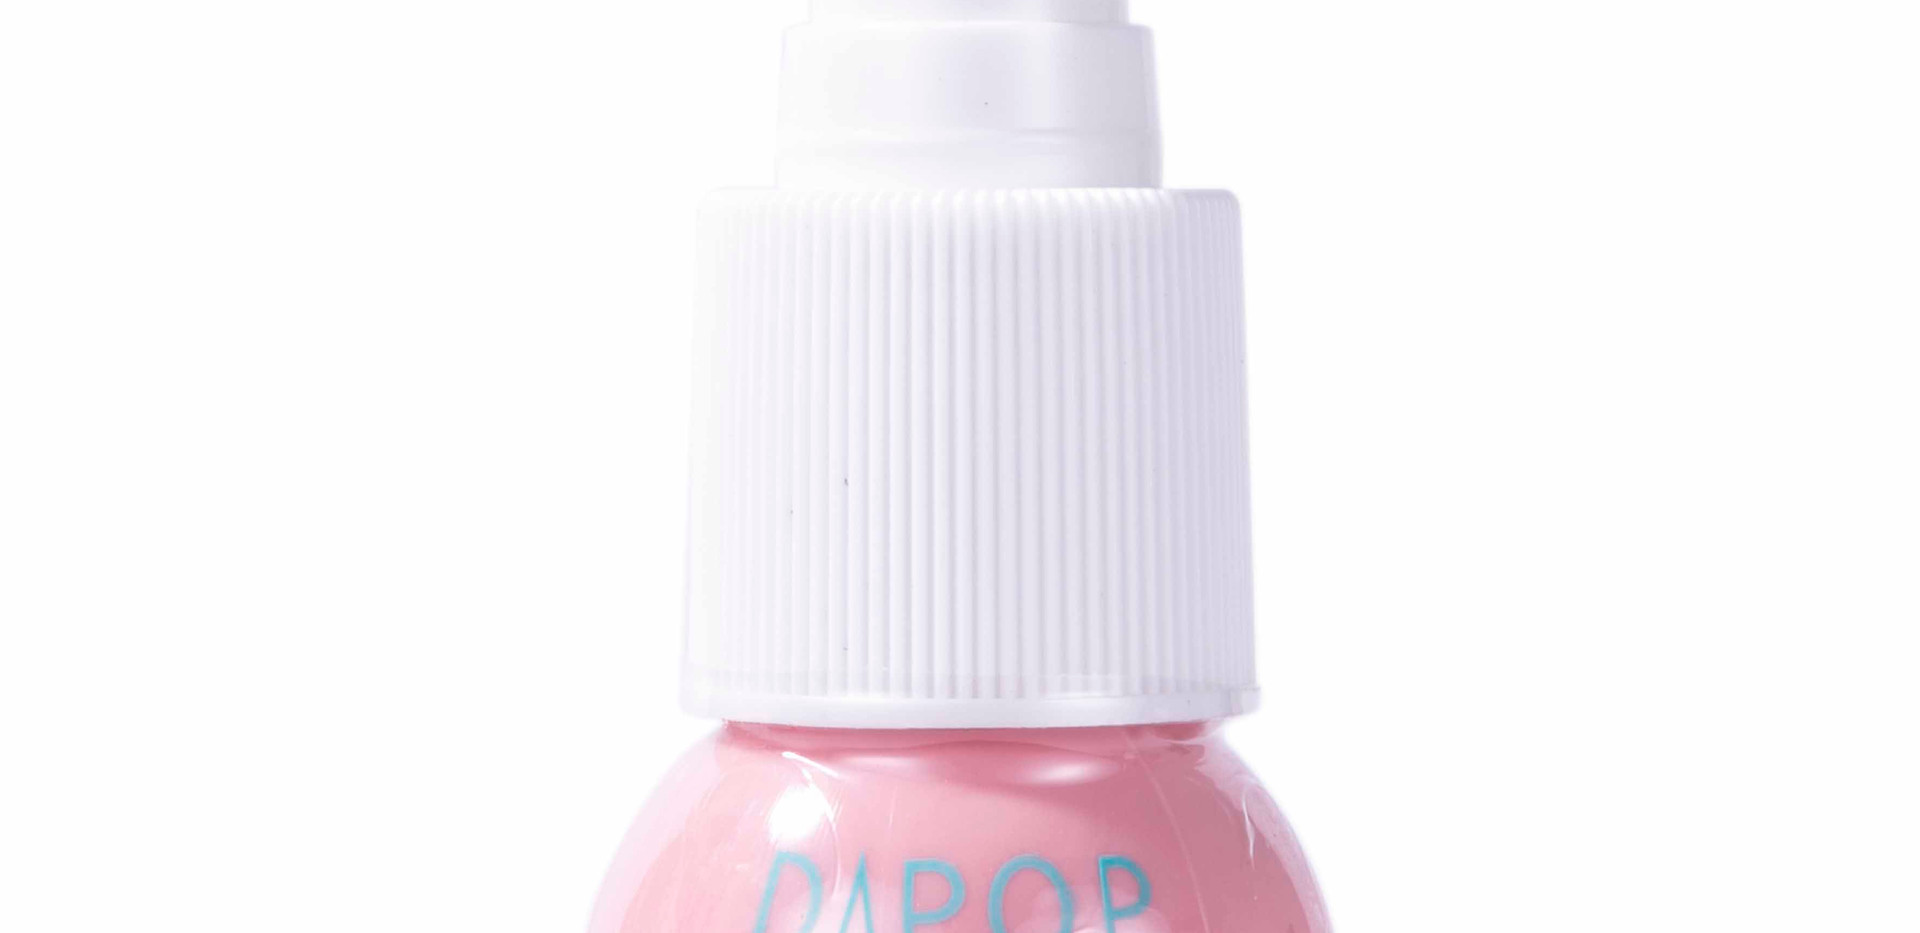 Bruma Fixadora Matificante Dapop - DP2038 (2)